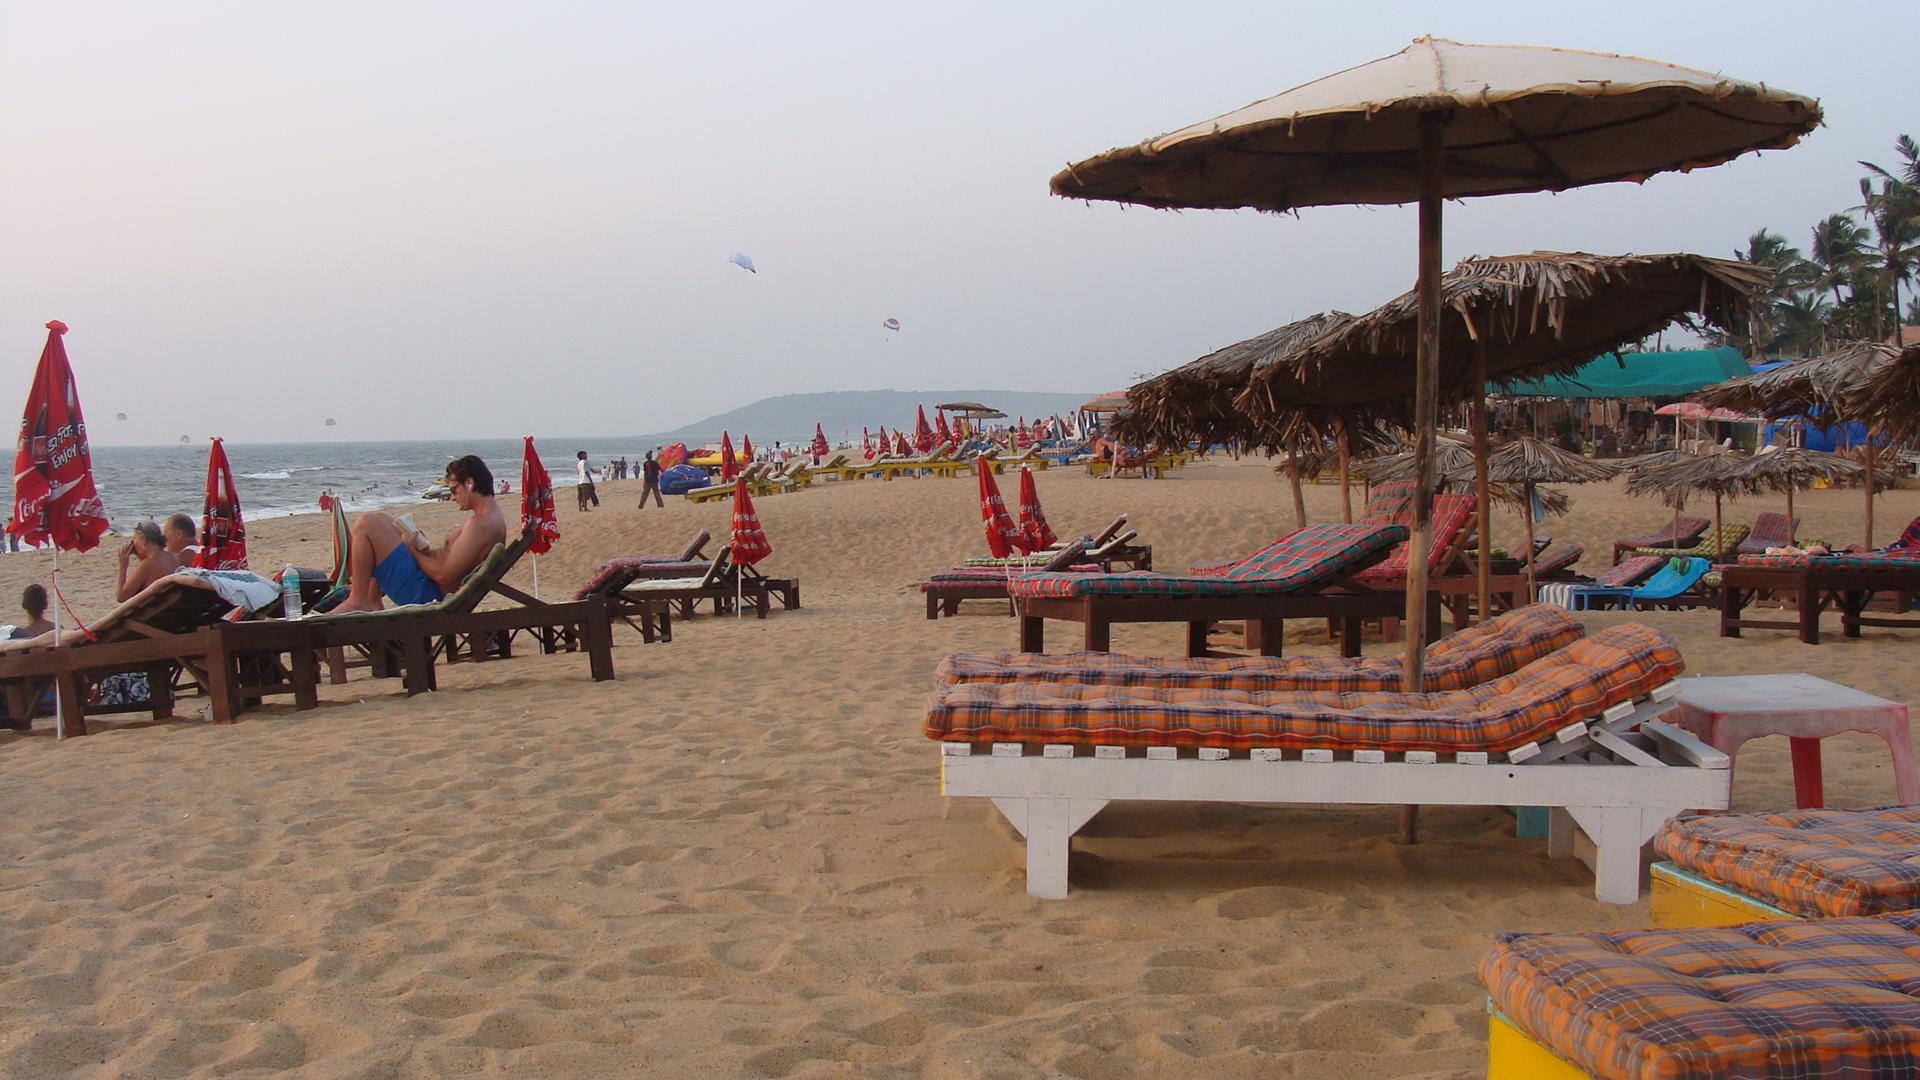 Goan sun beds